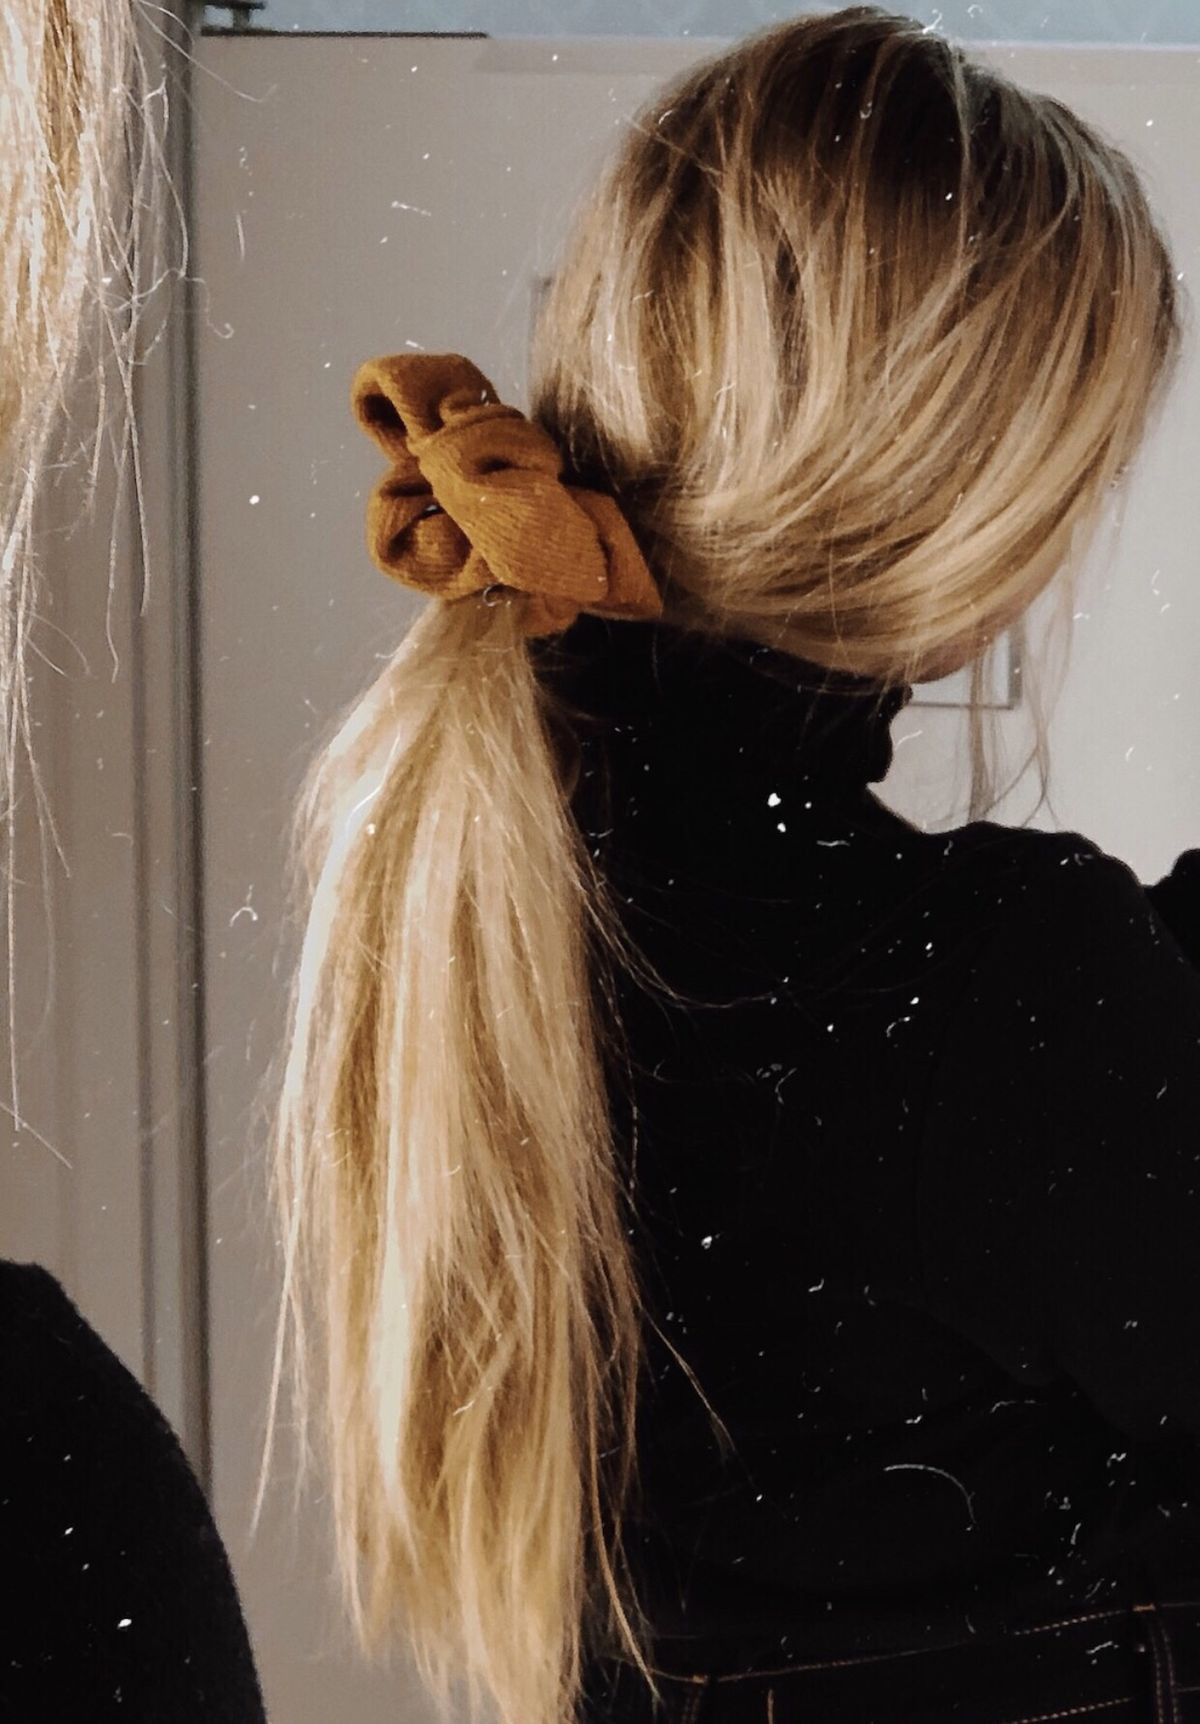 HAIR STYLES 2019-05-08 19:52:12